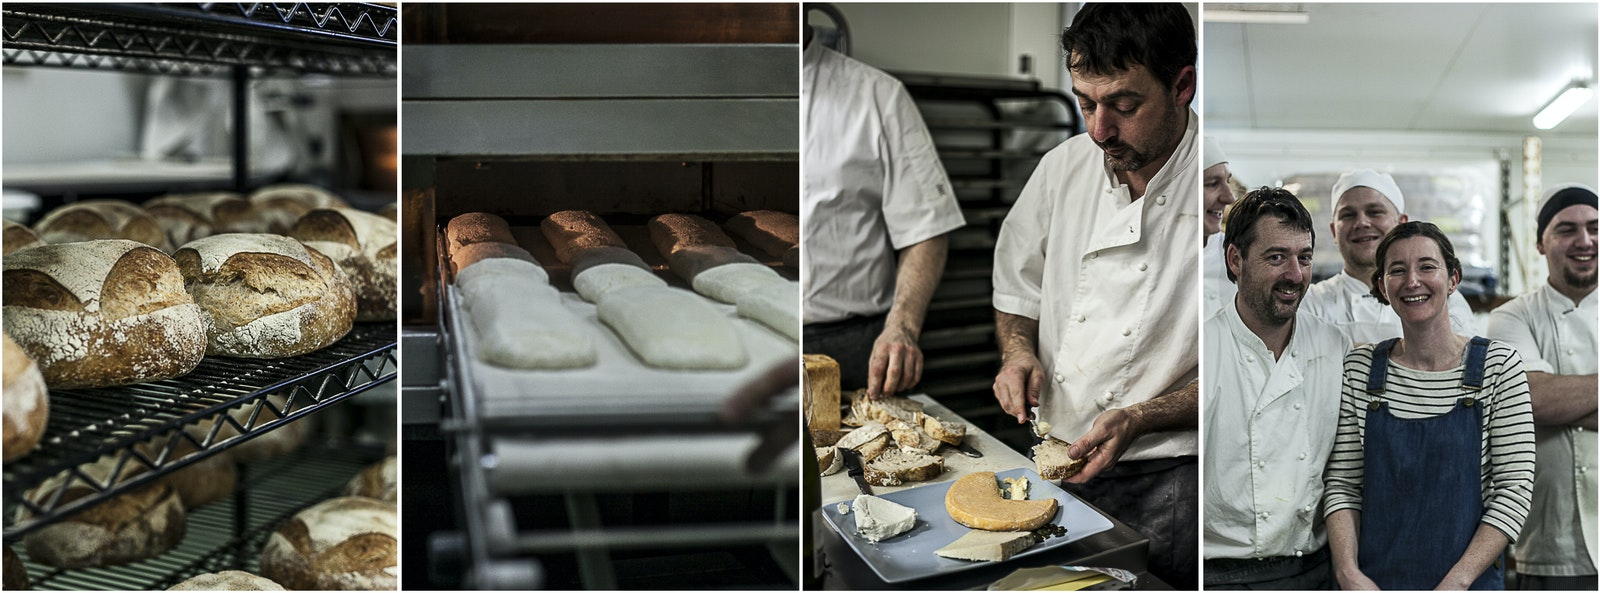 milawa_bread_banner